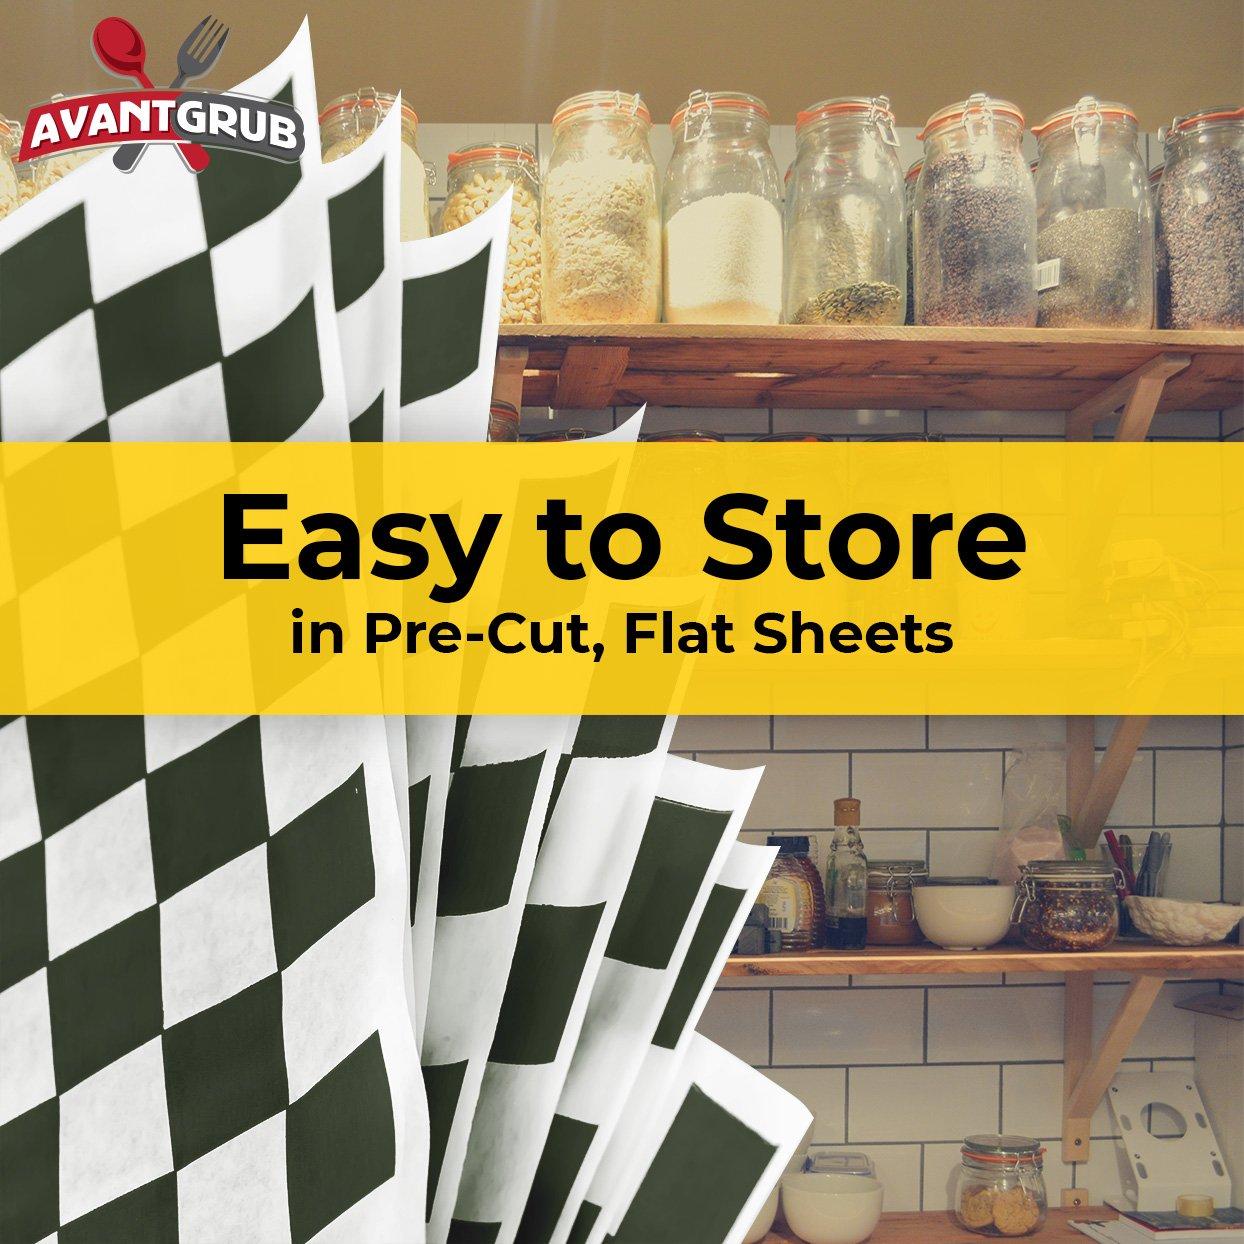 miniature 16 - [300 Pack] Retro Deli Sandwich Liner 15x15 Wax Patty Paper Sheets by Avant Grub